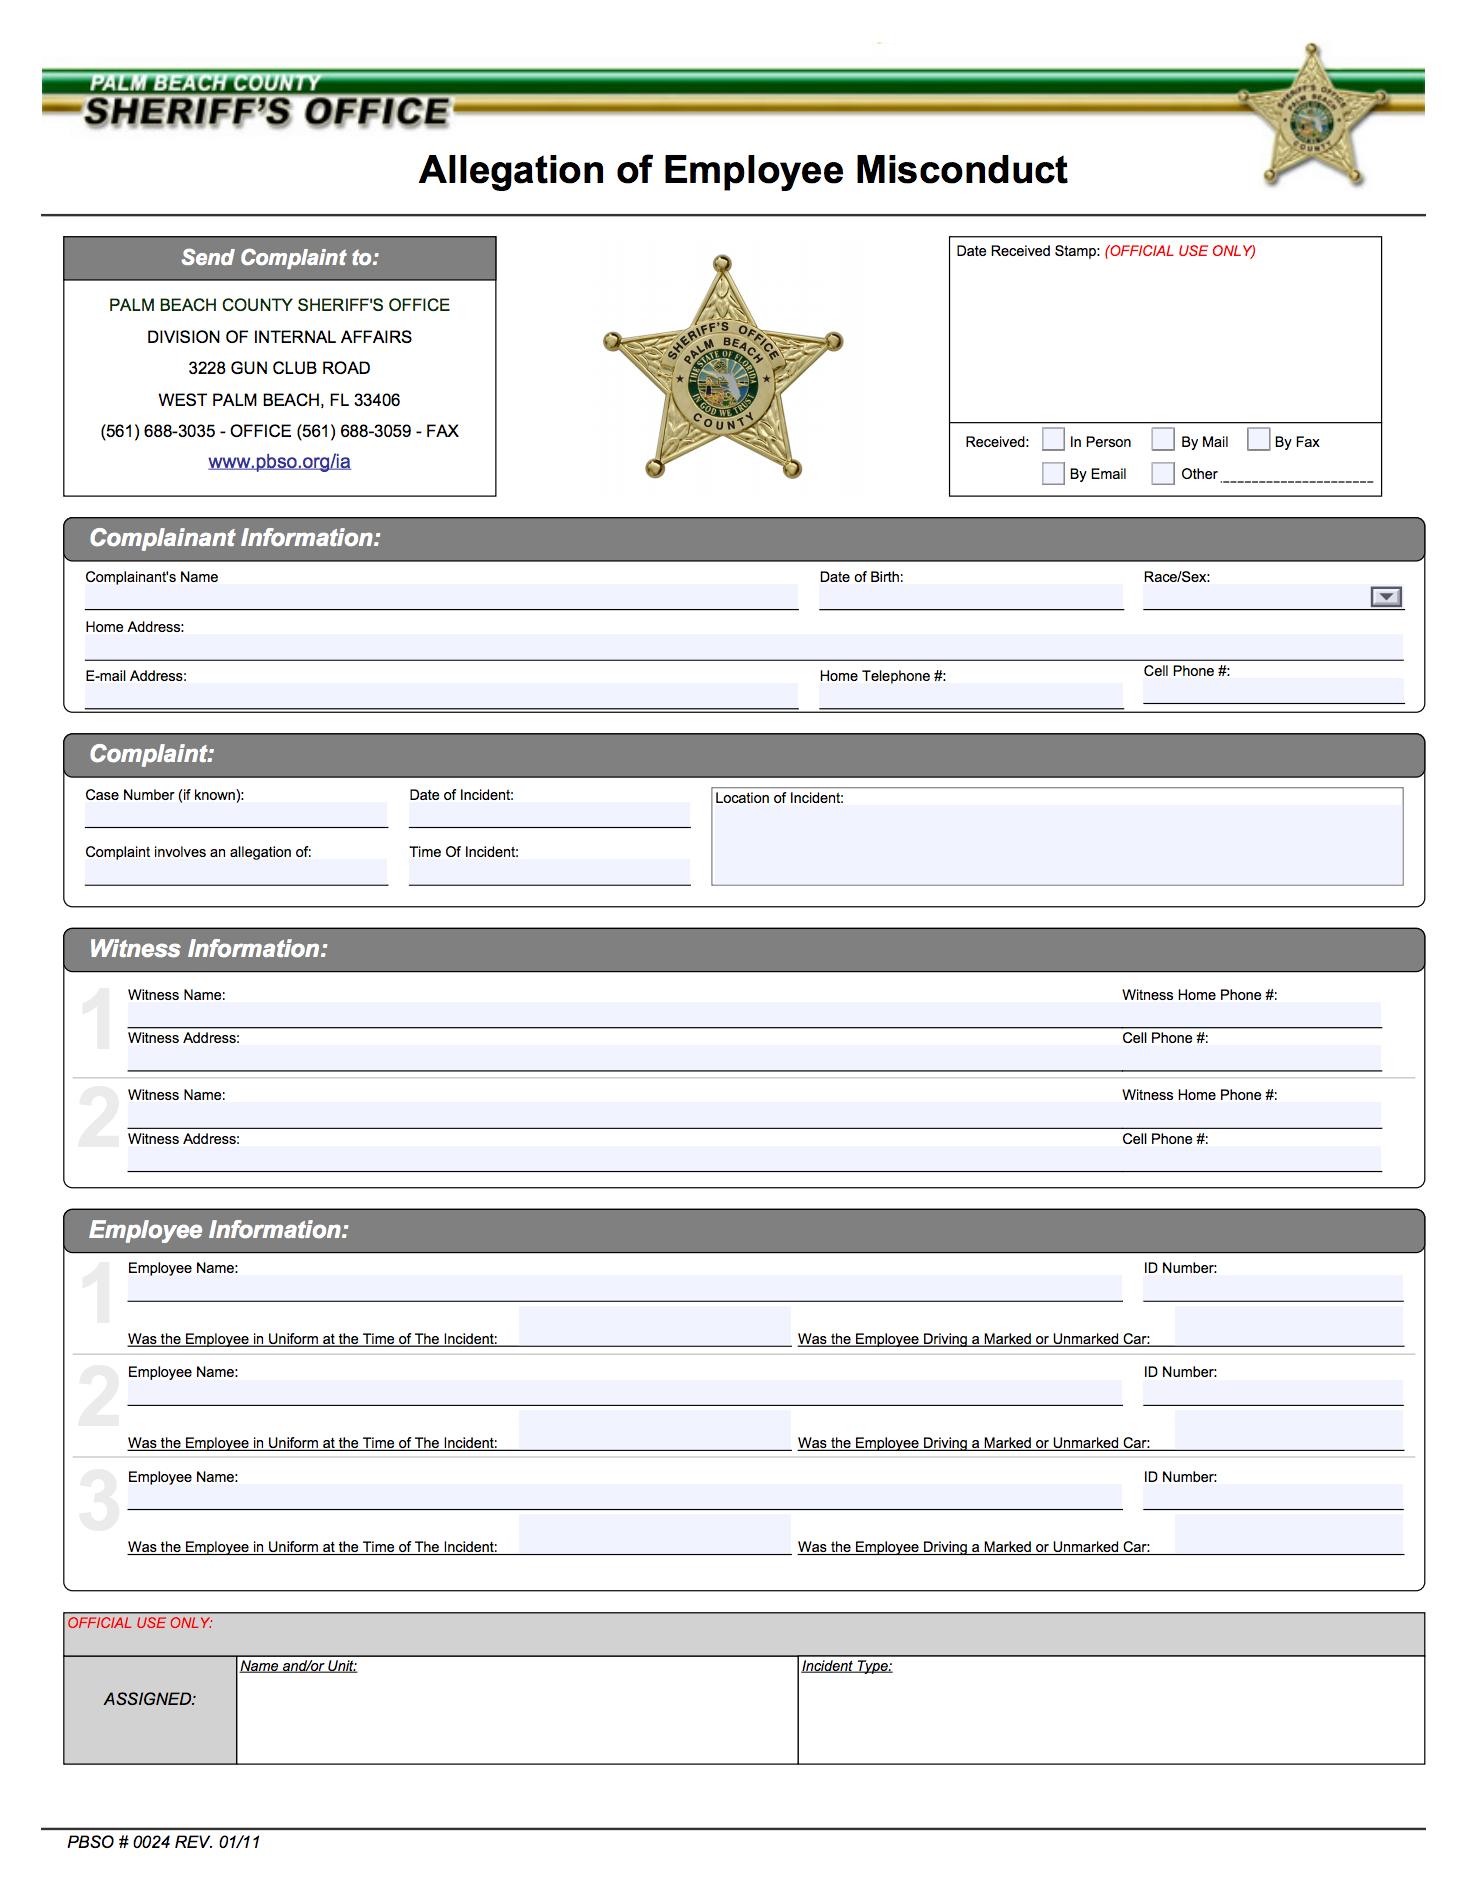 Internal Affairs - Palm Beach County Sheriff\'s Office